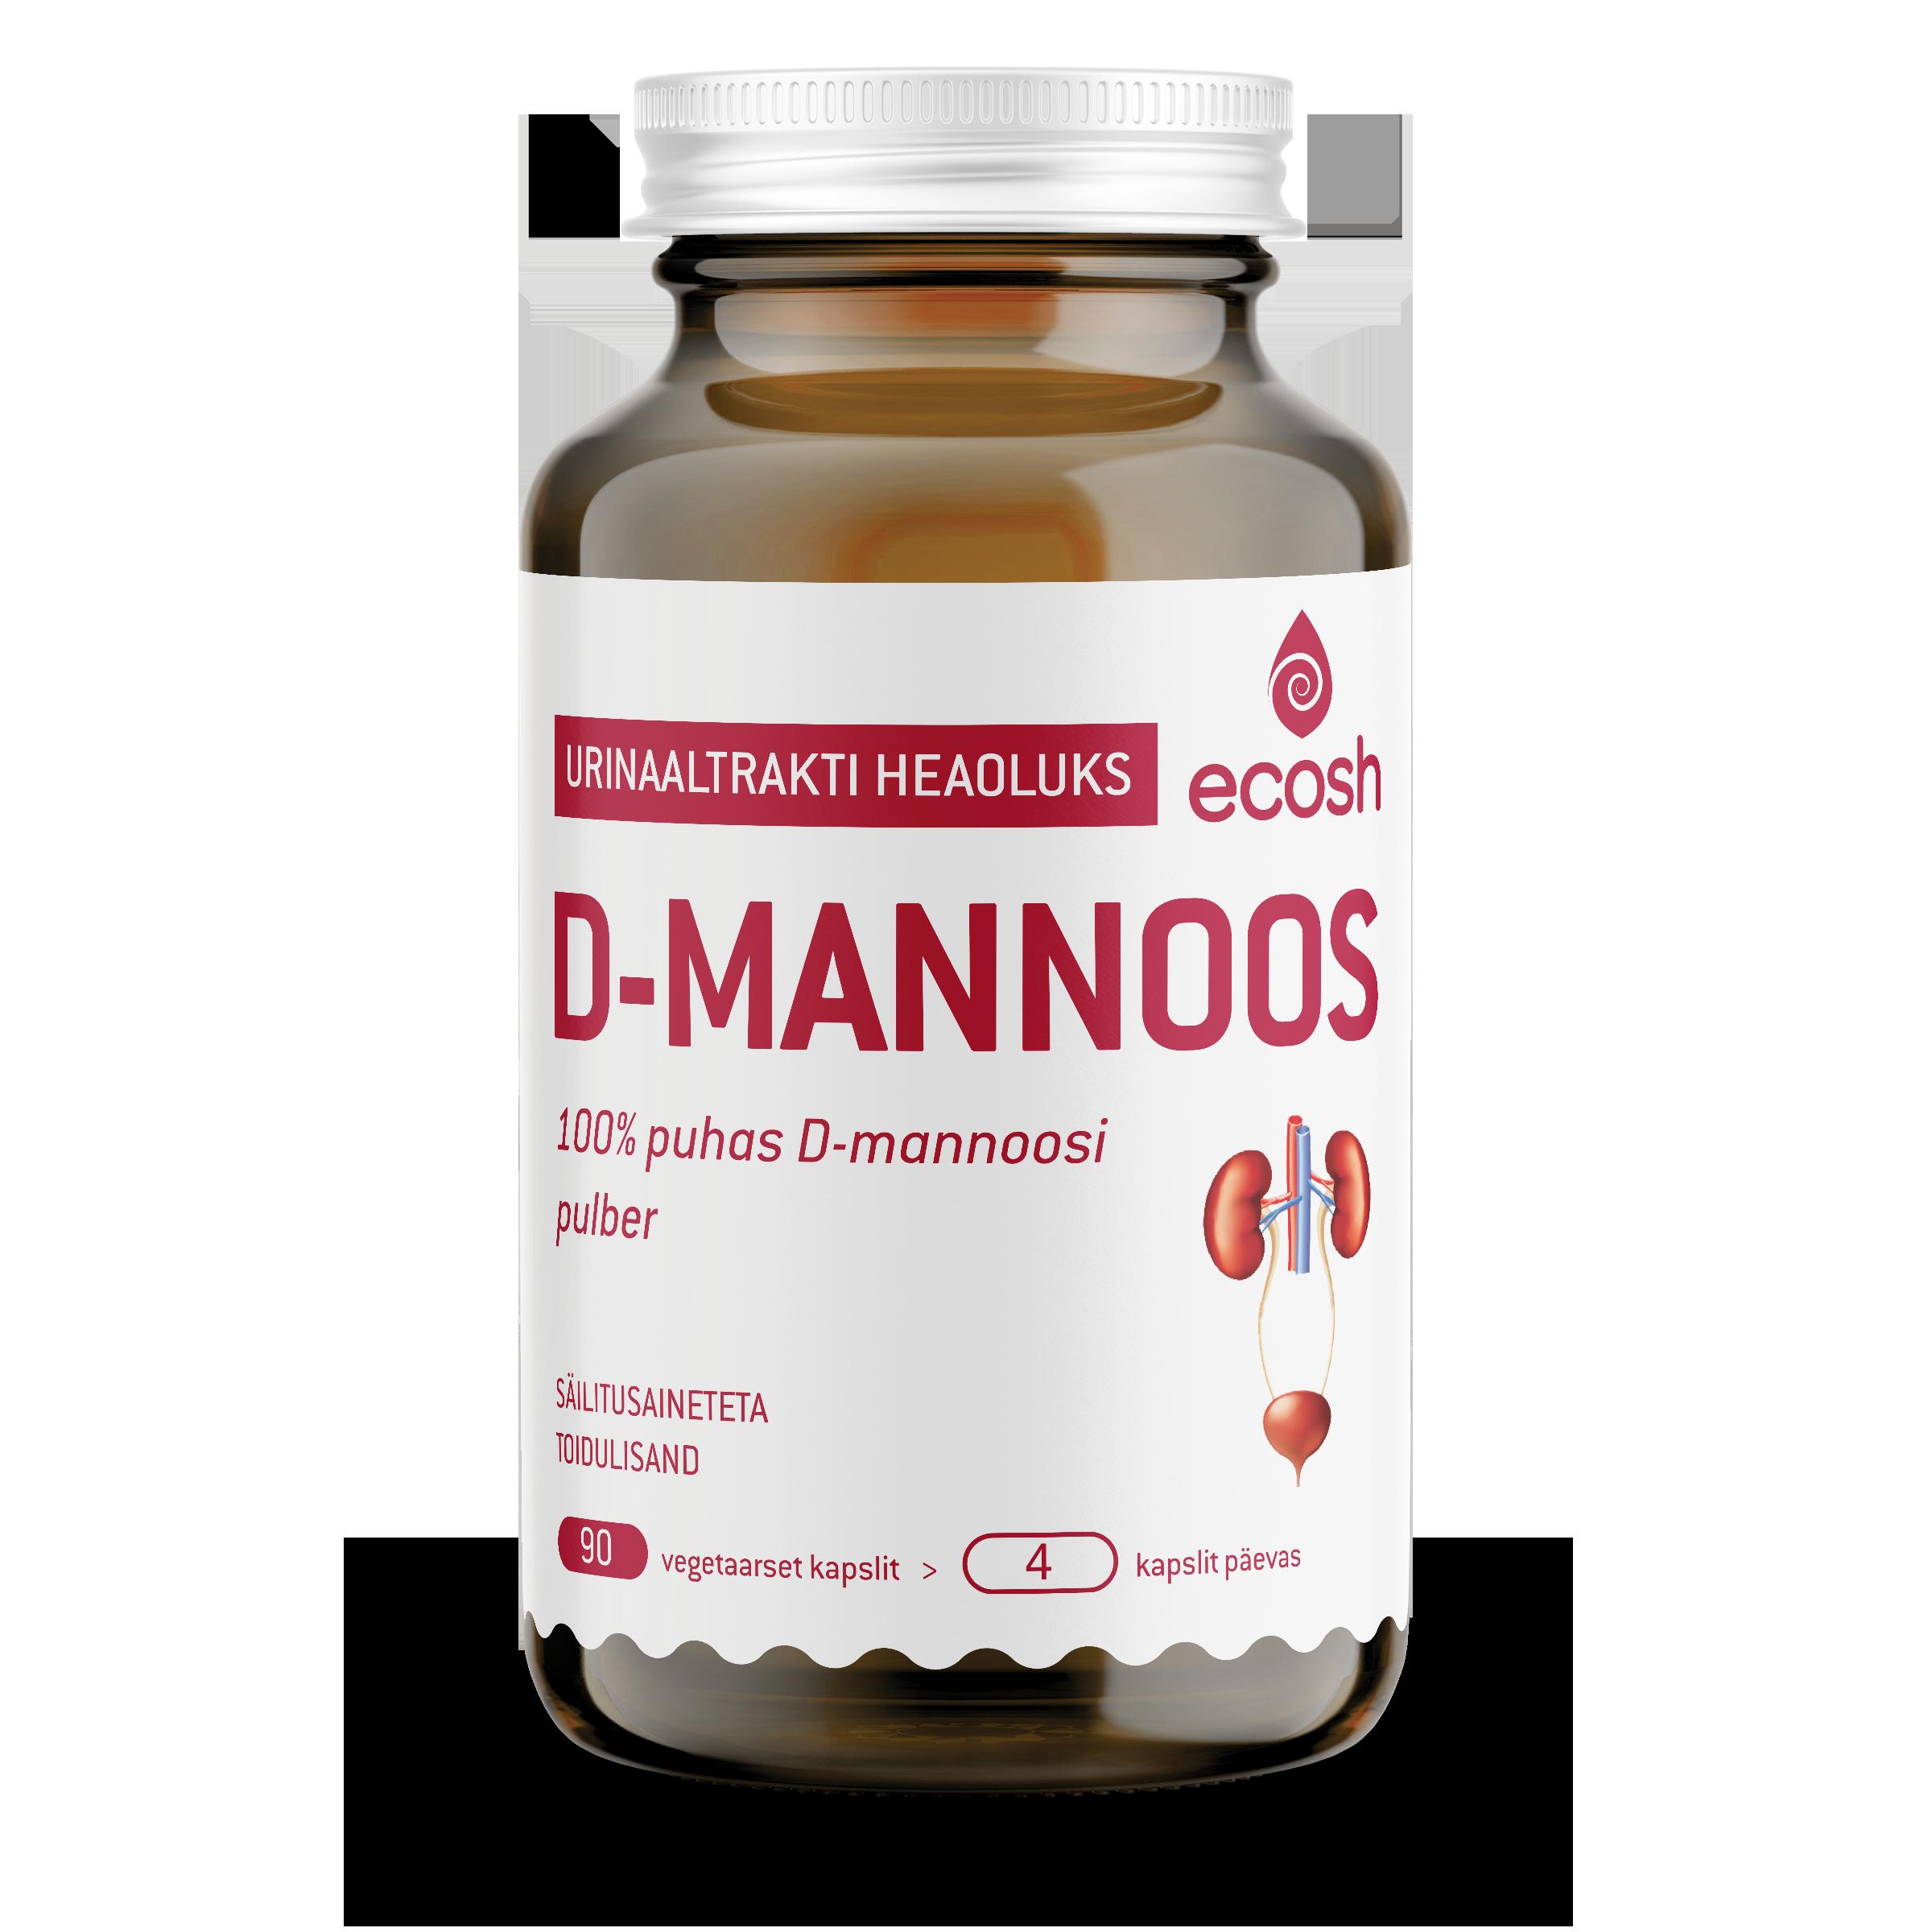 D-MANNOOS